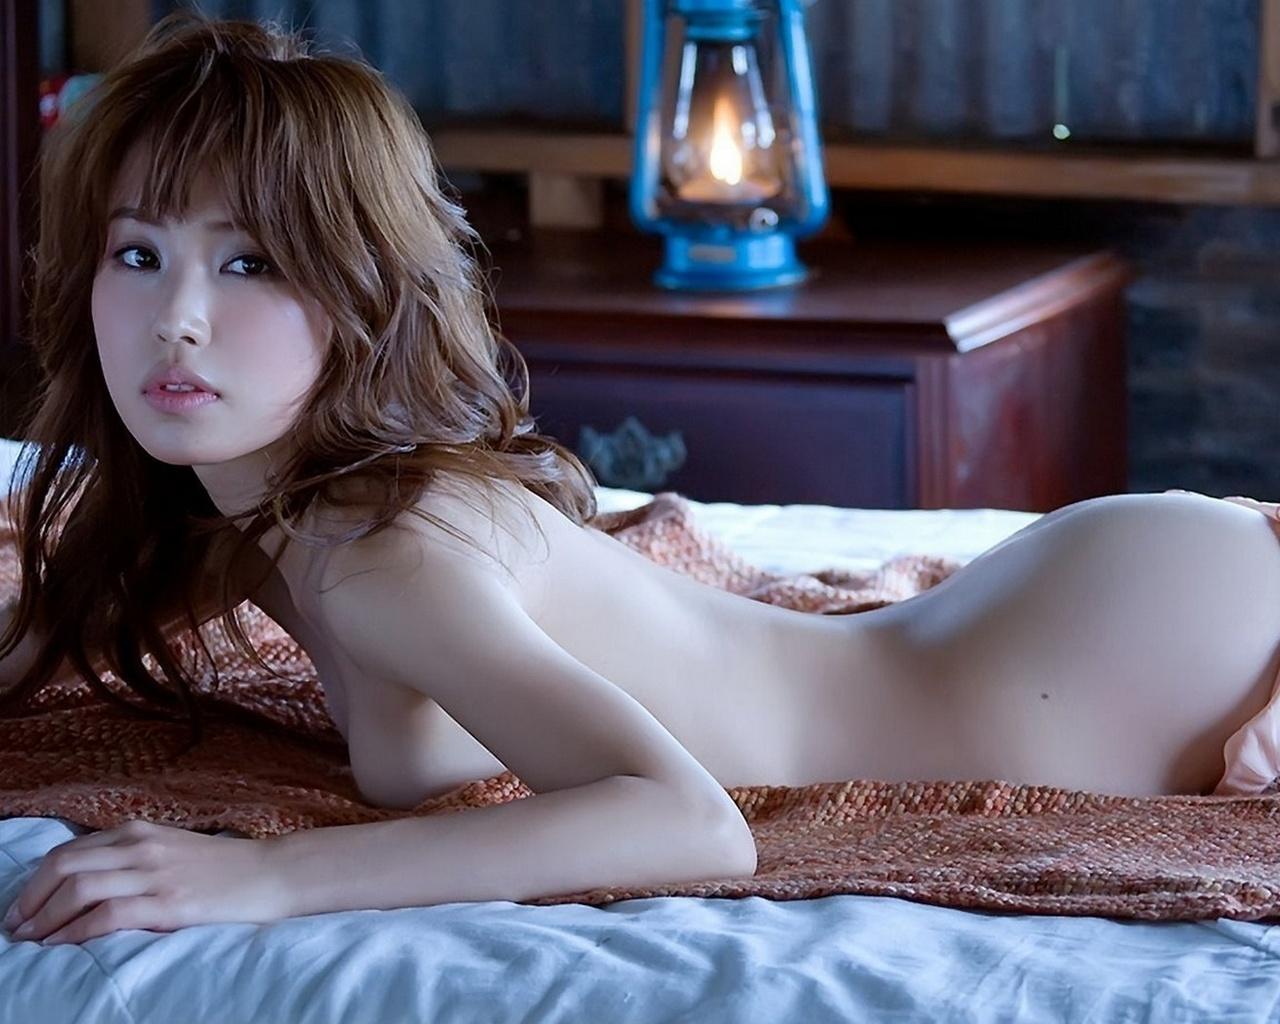 японские девчонки эротика